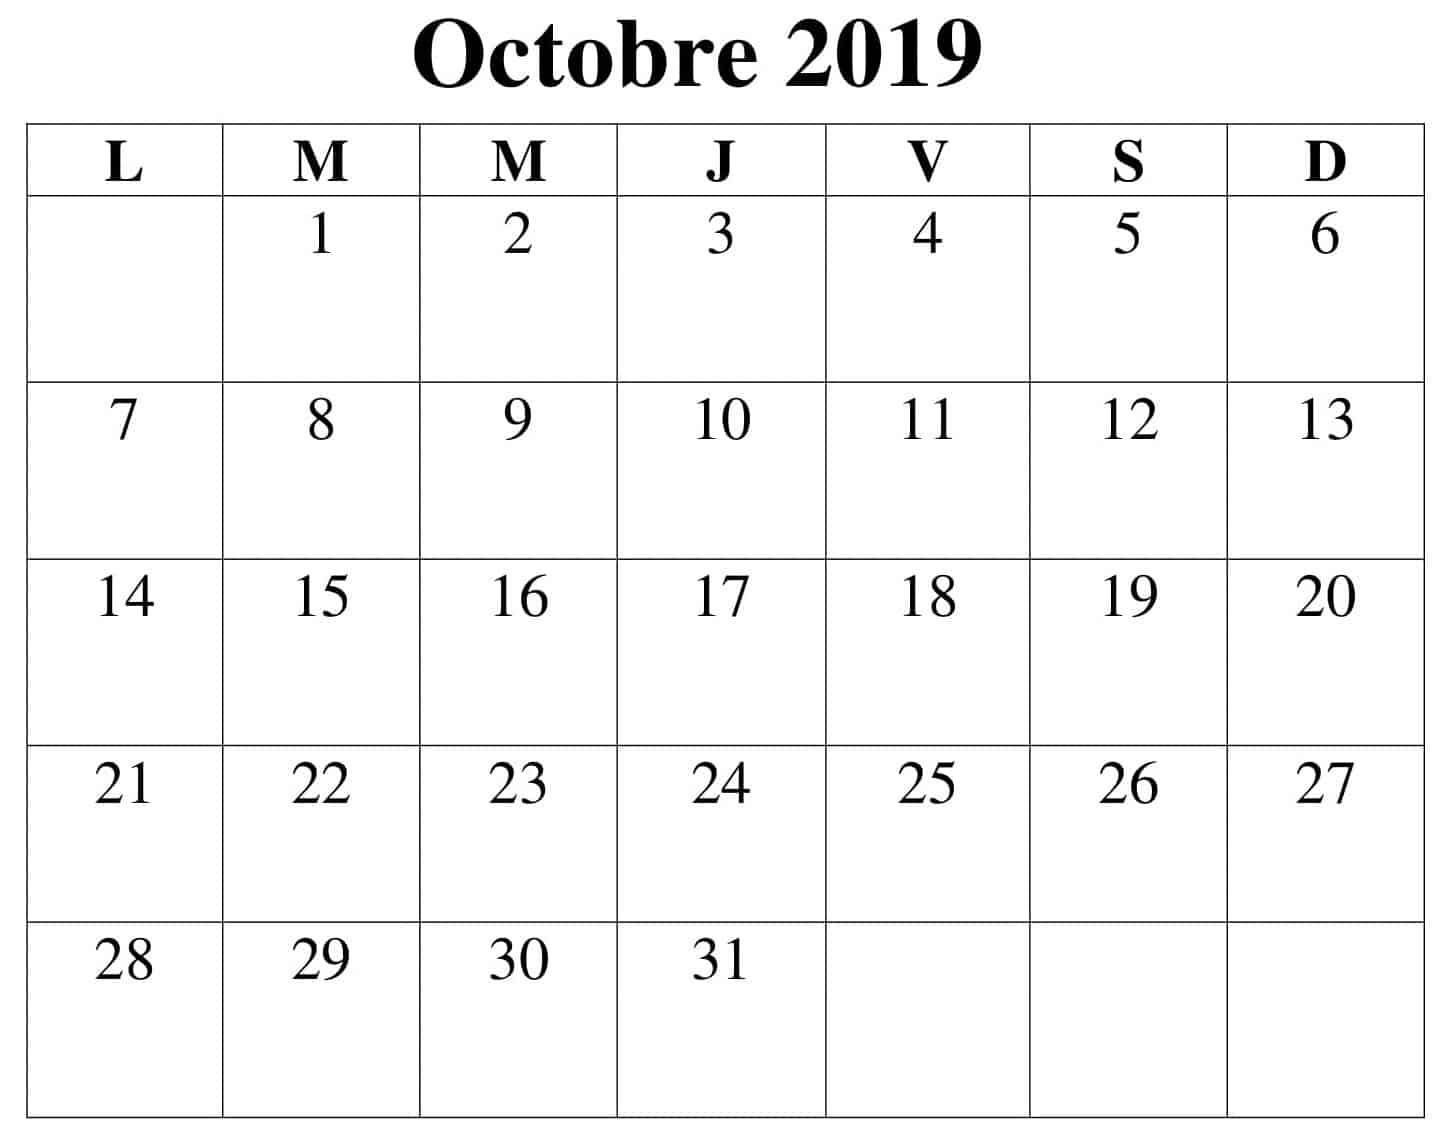 Calendrier Document Octobre 2019 PDF